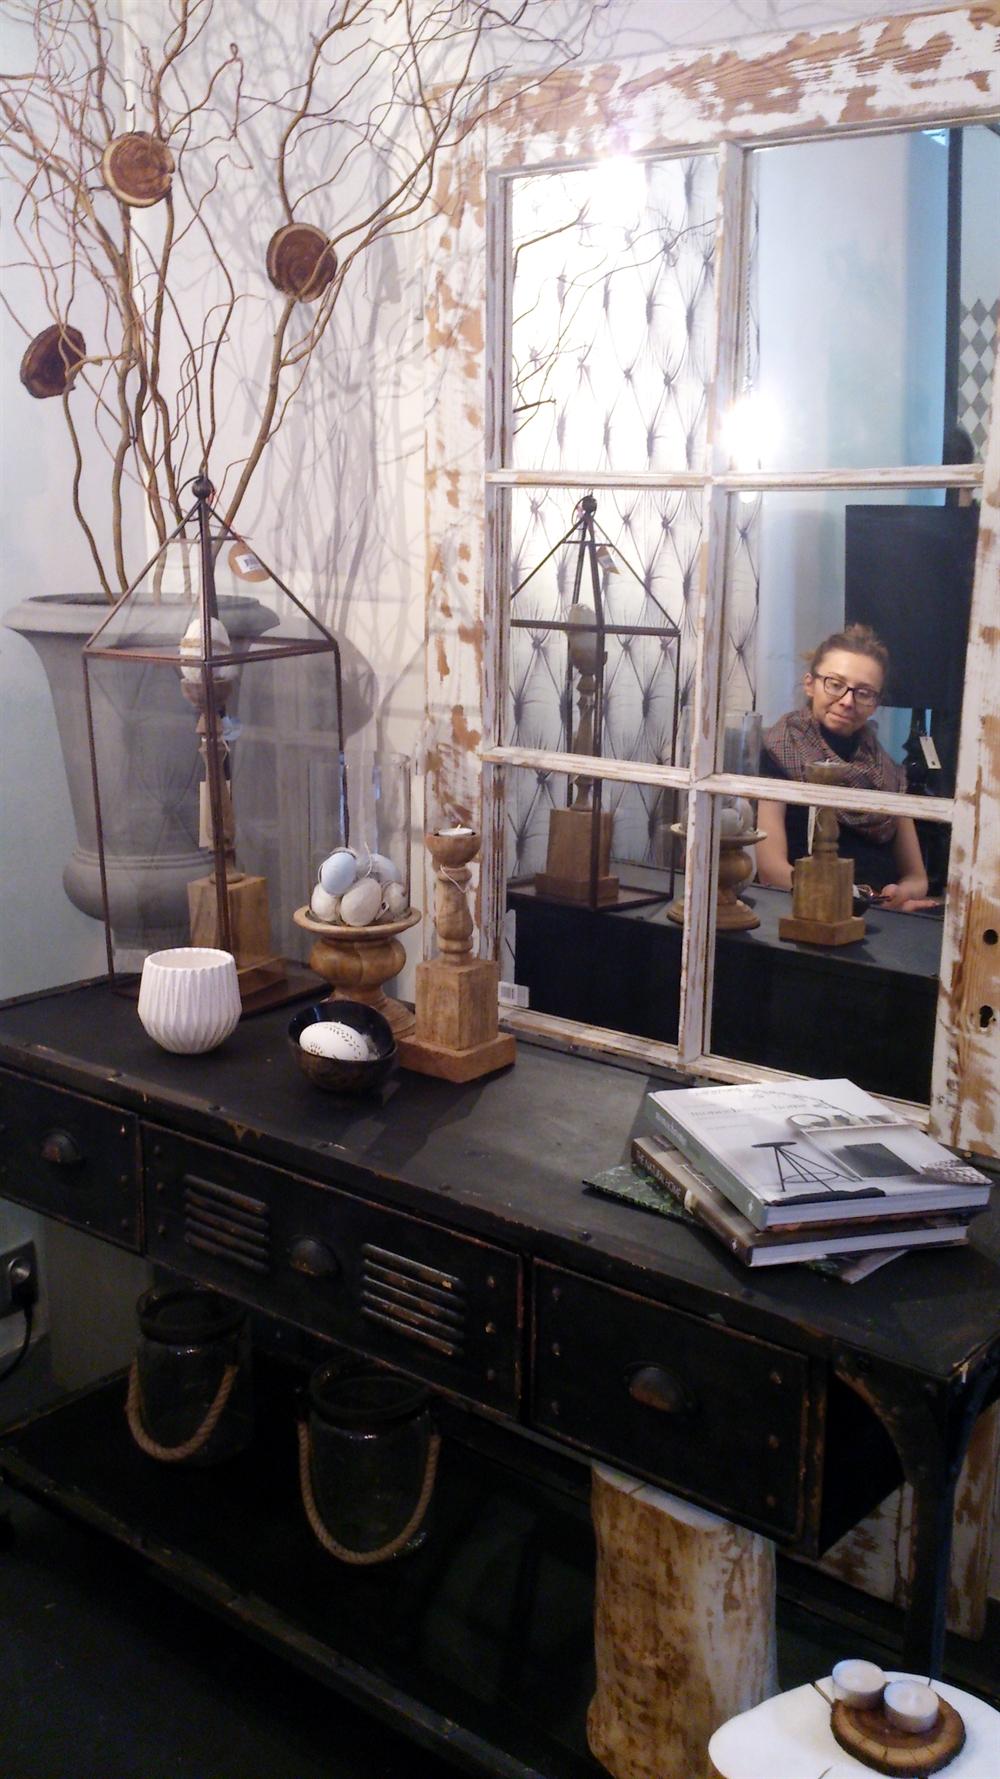 13 malabelle warsztaty stylizacji interior design styling workshop home decor dekoracja stolu minimalizm minimalist home style scandinavian chic